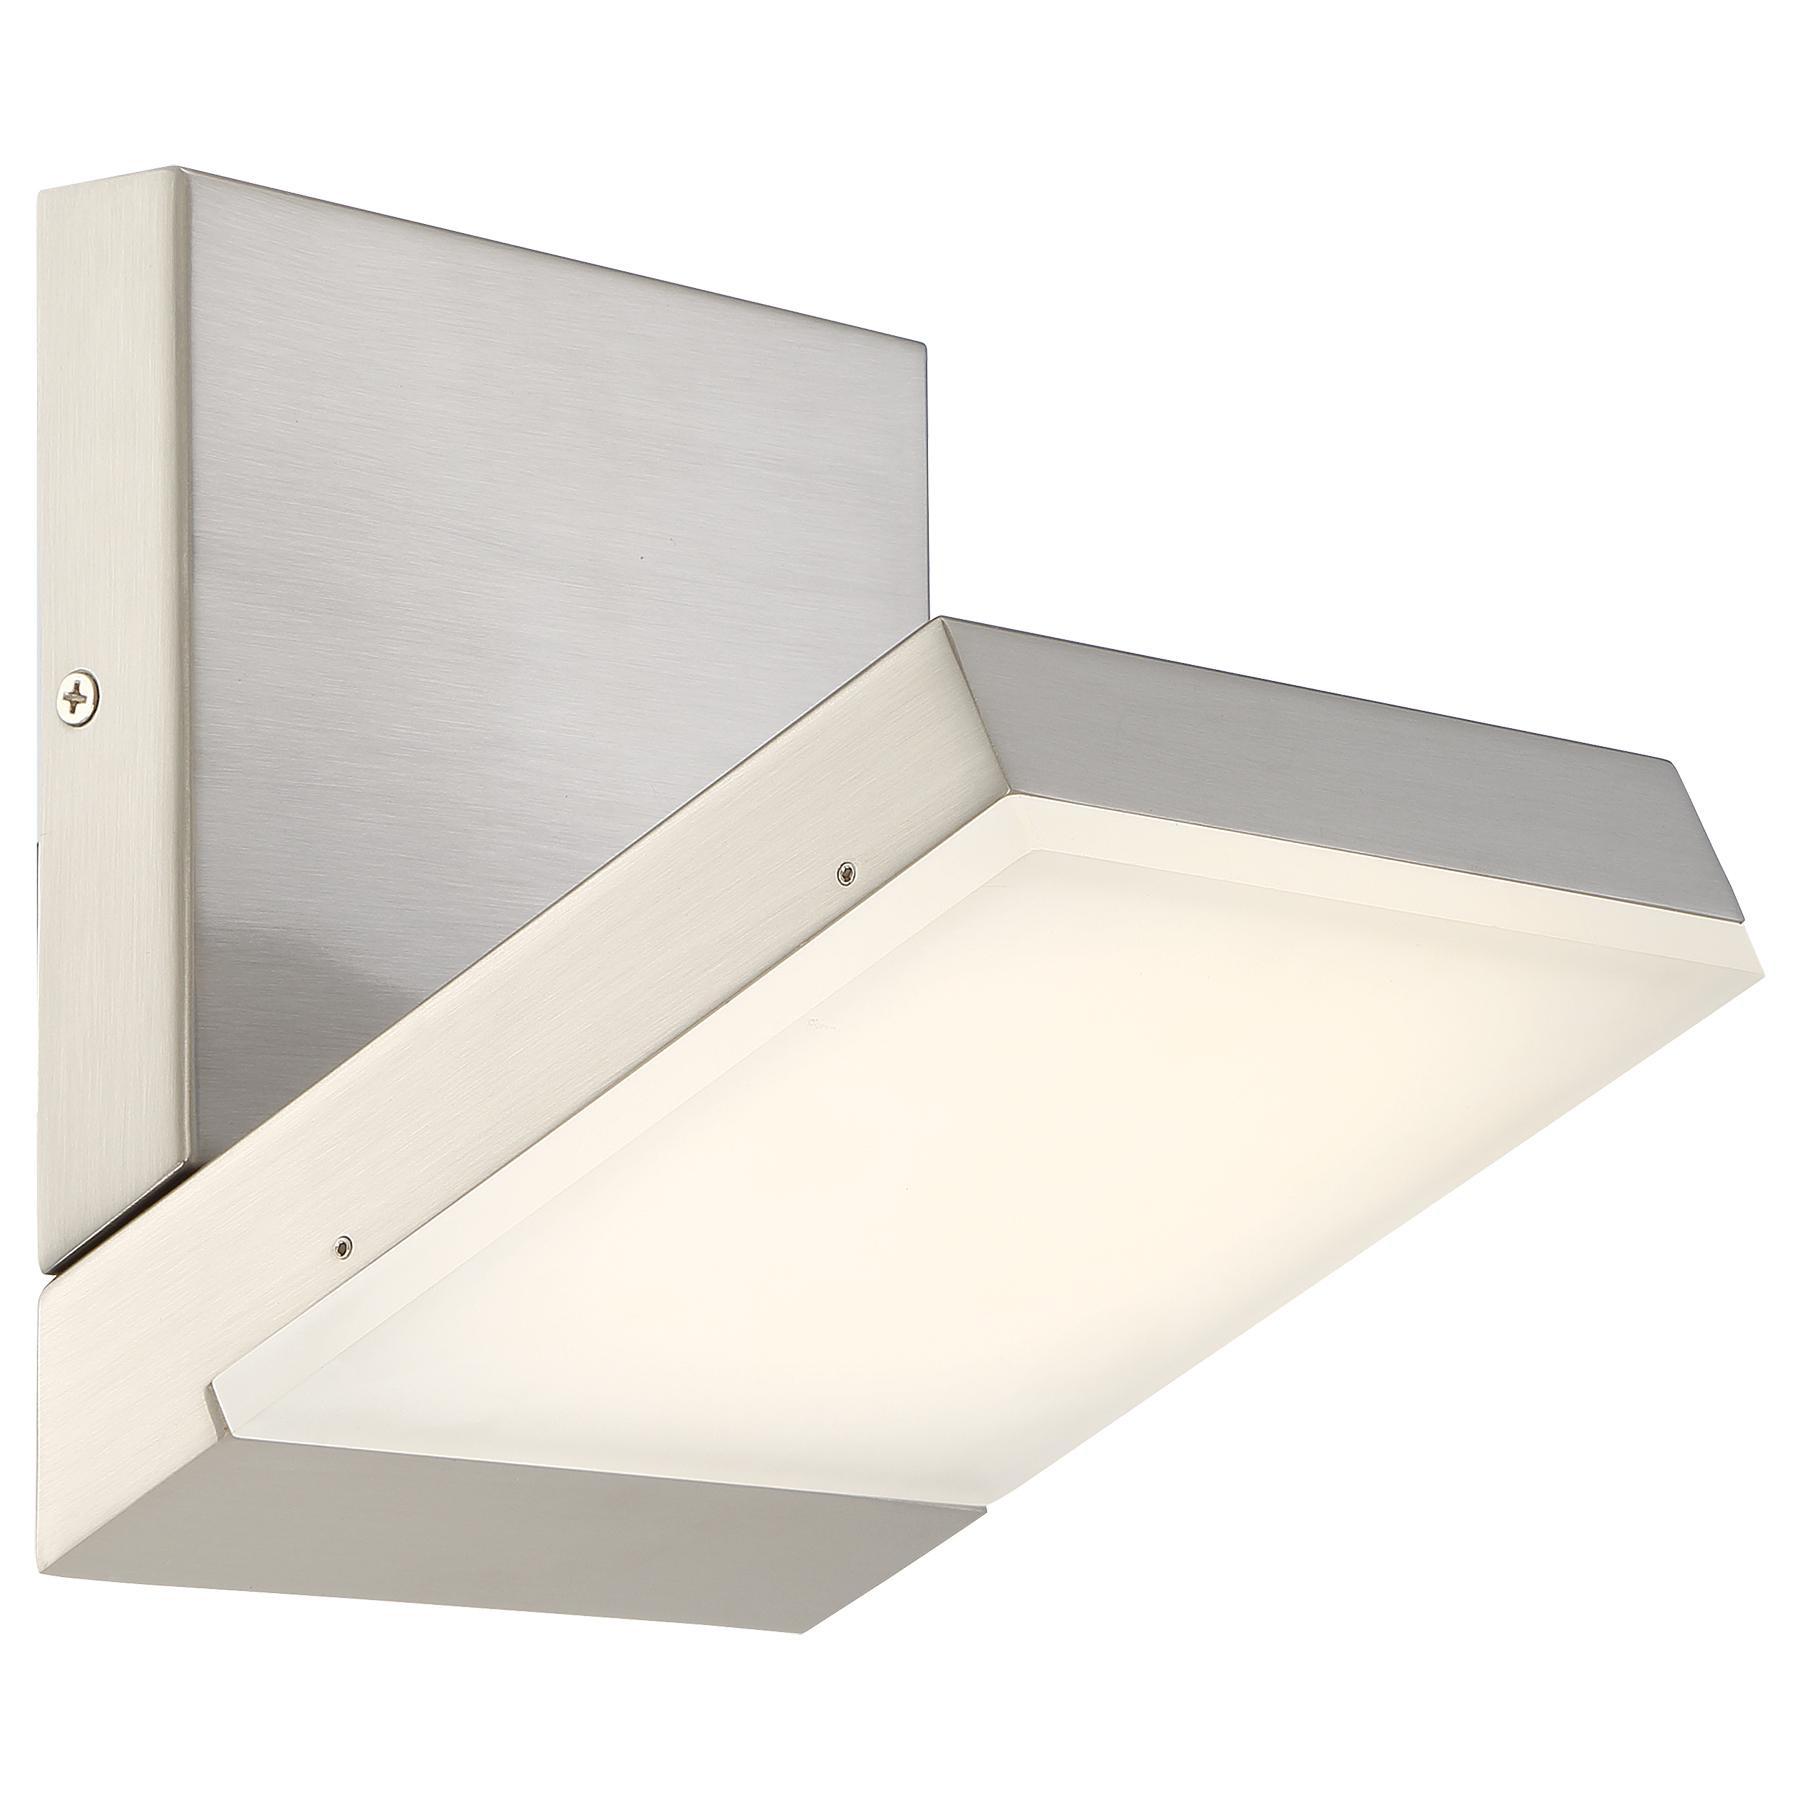 Angle Bathroom Vanity Light By George Kovacs P1251 084 L